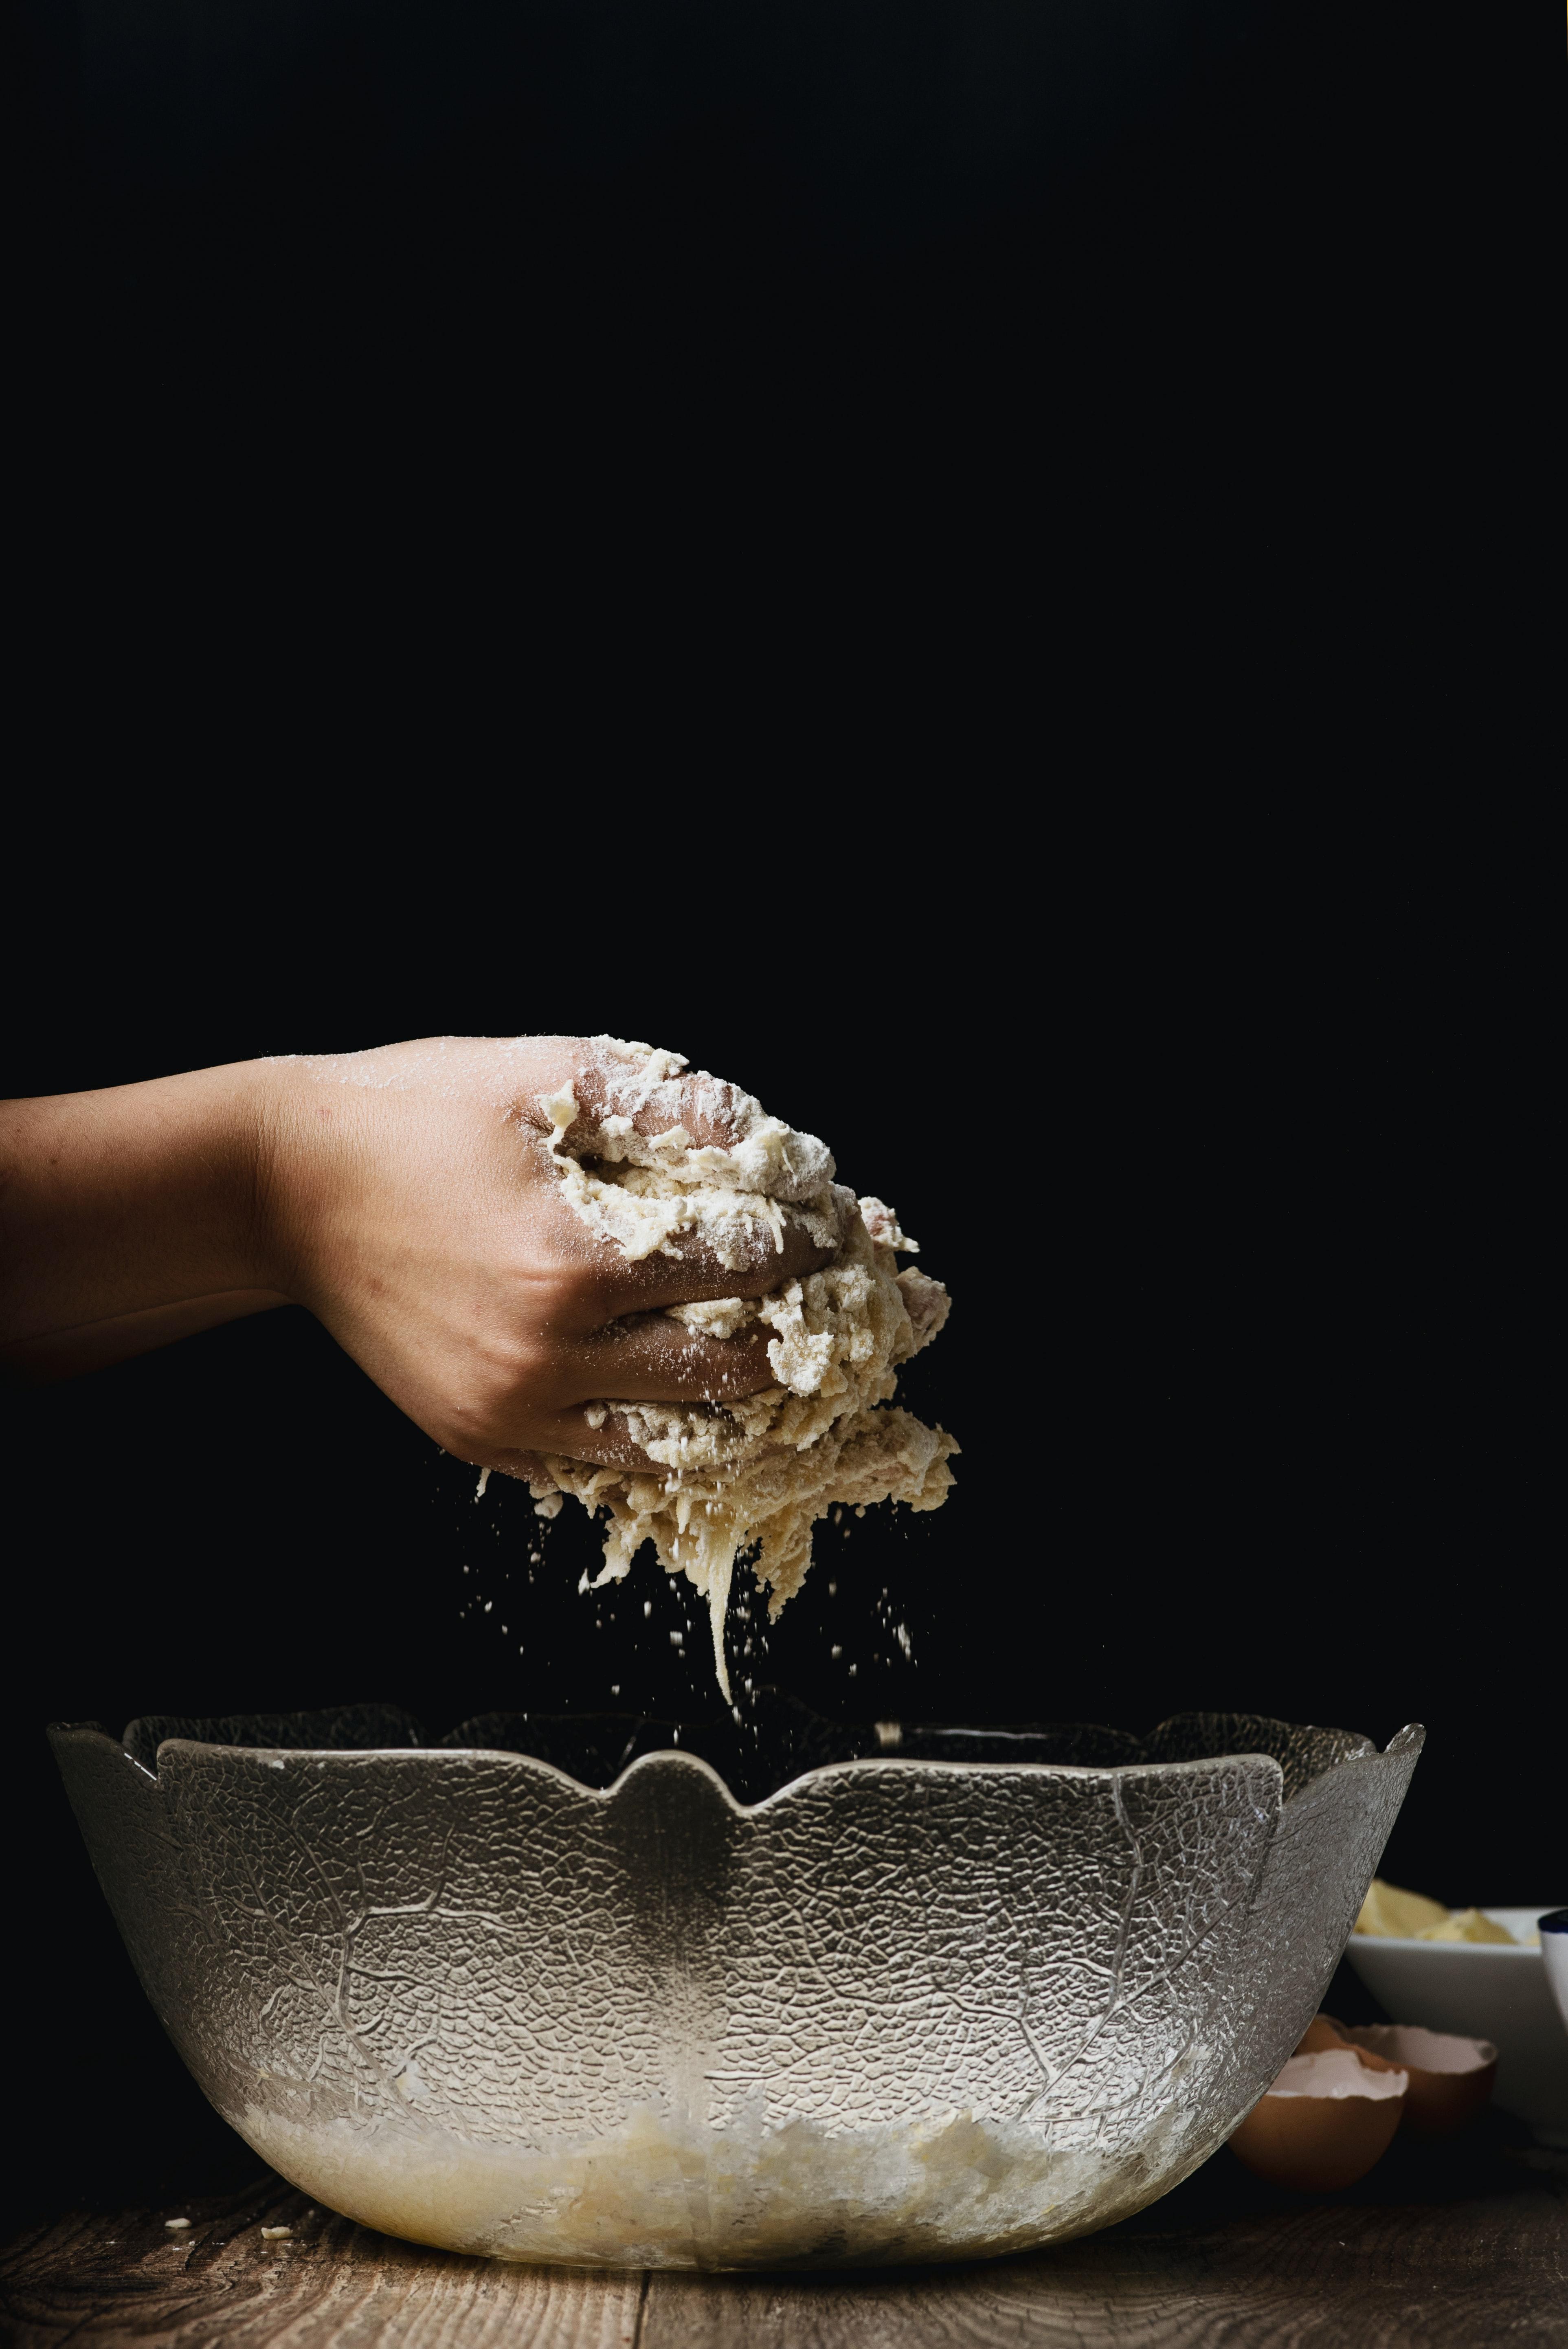 Hands mixing dough above glass bowl